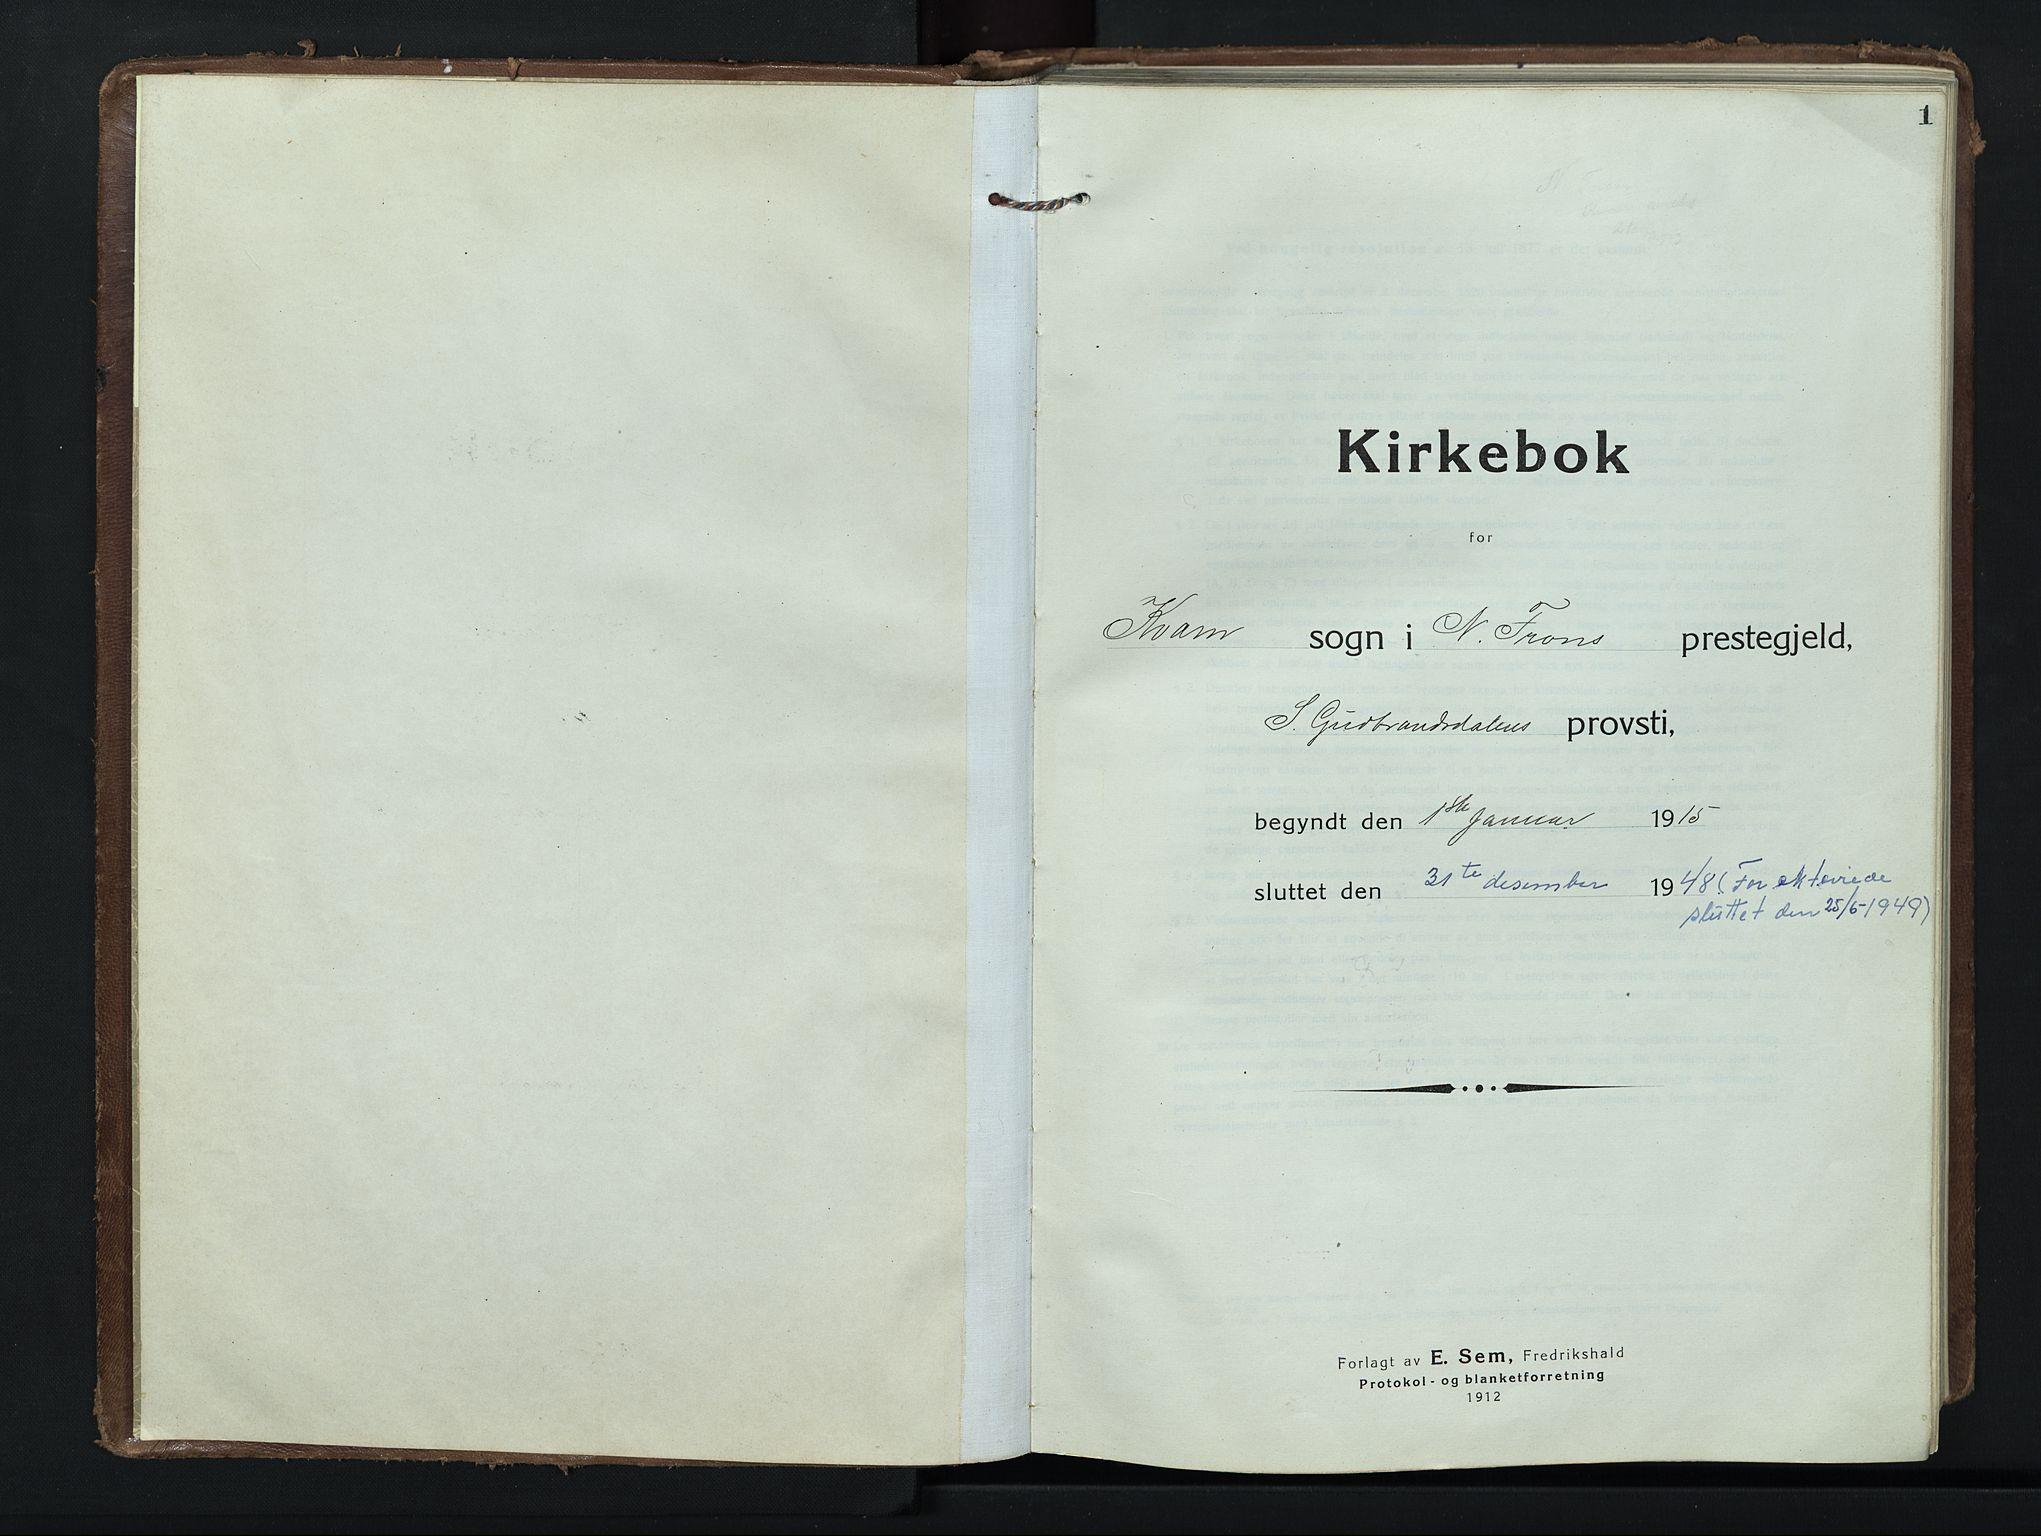 SAH, Nord-Fron prestekontor, Klokkerbok nr. 8, 1915-1948, s. 0-1